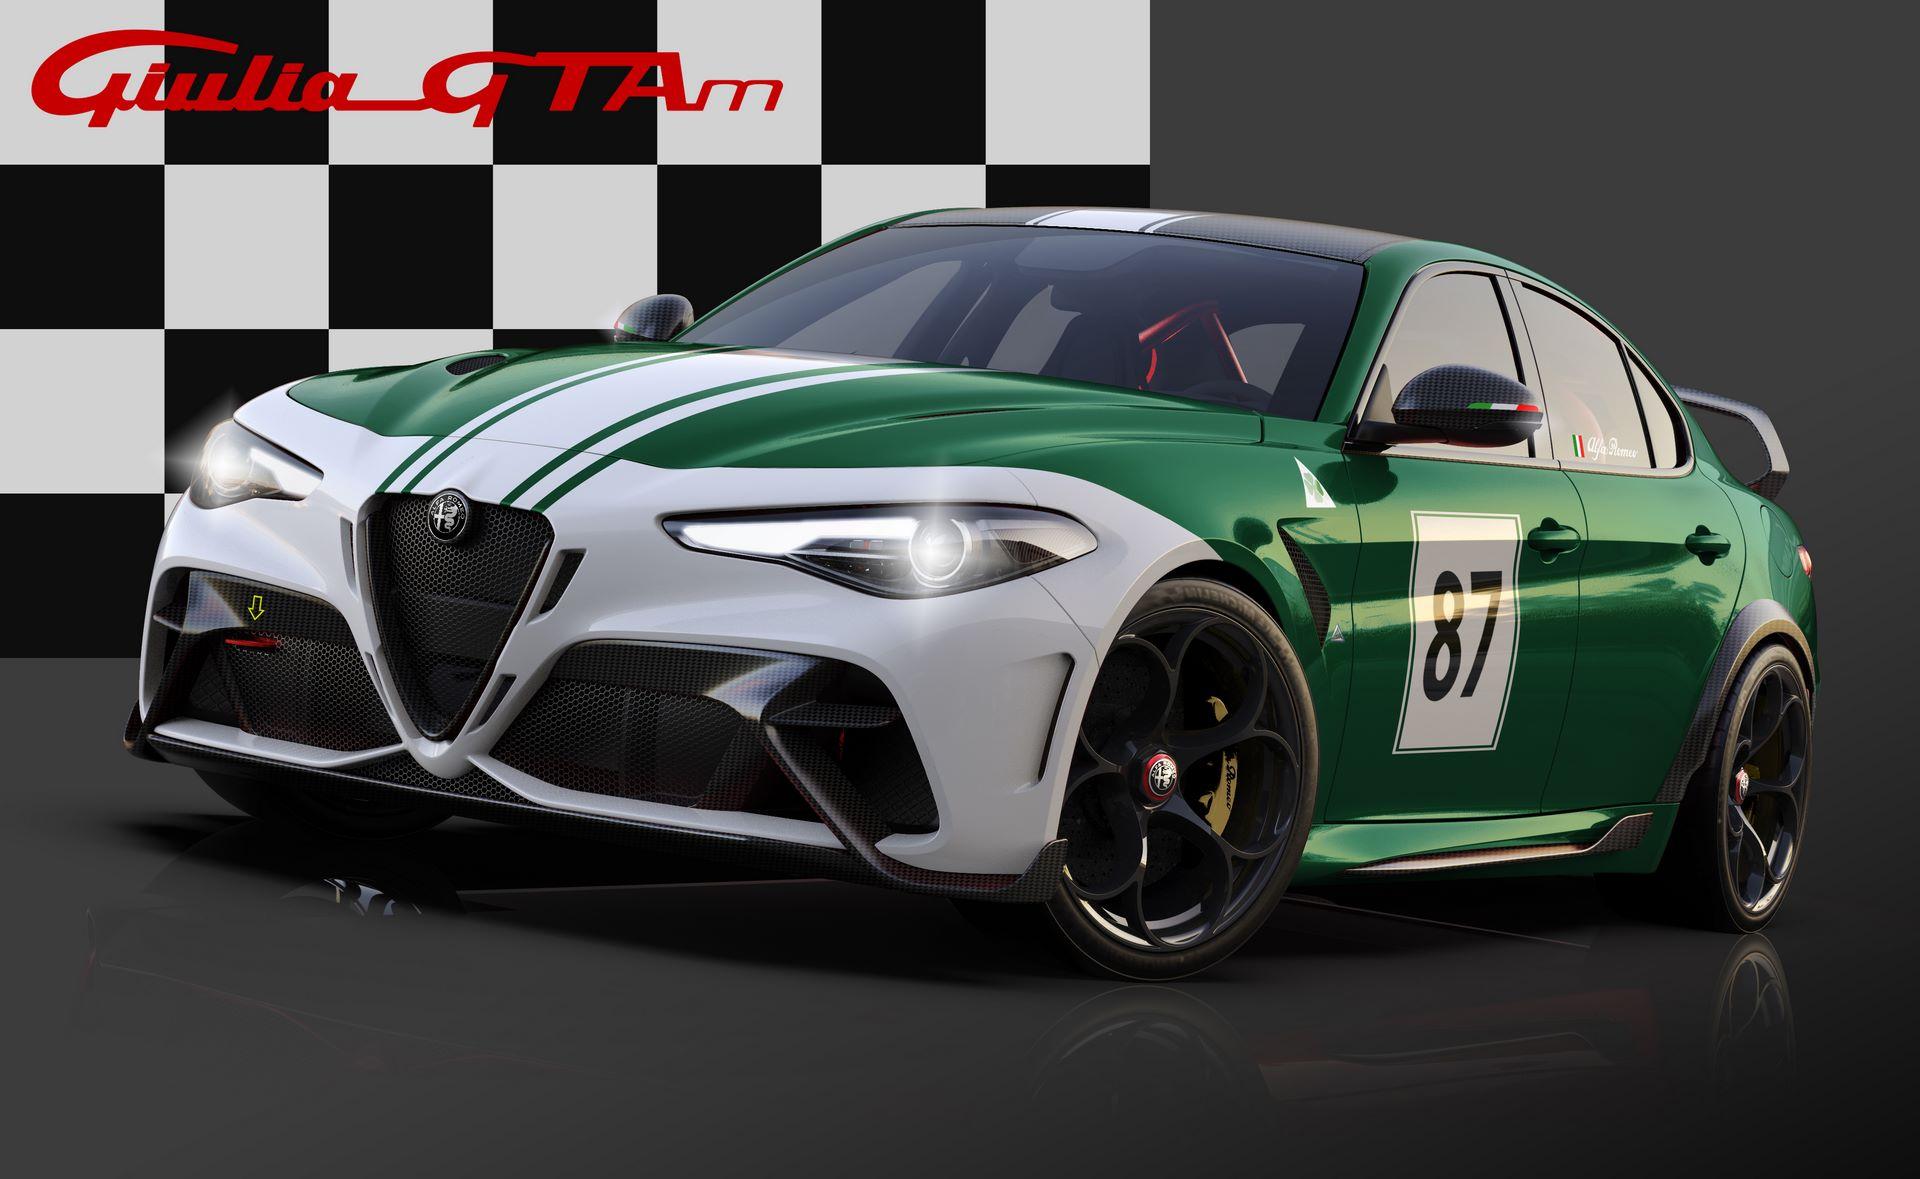 25_Alfa-Romeo-Giulia-GTA-dedicated-Livery